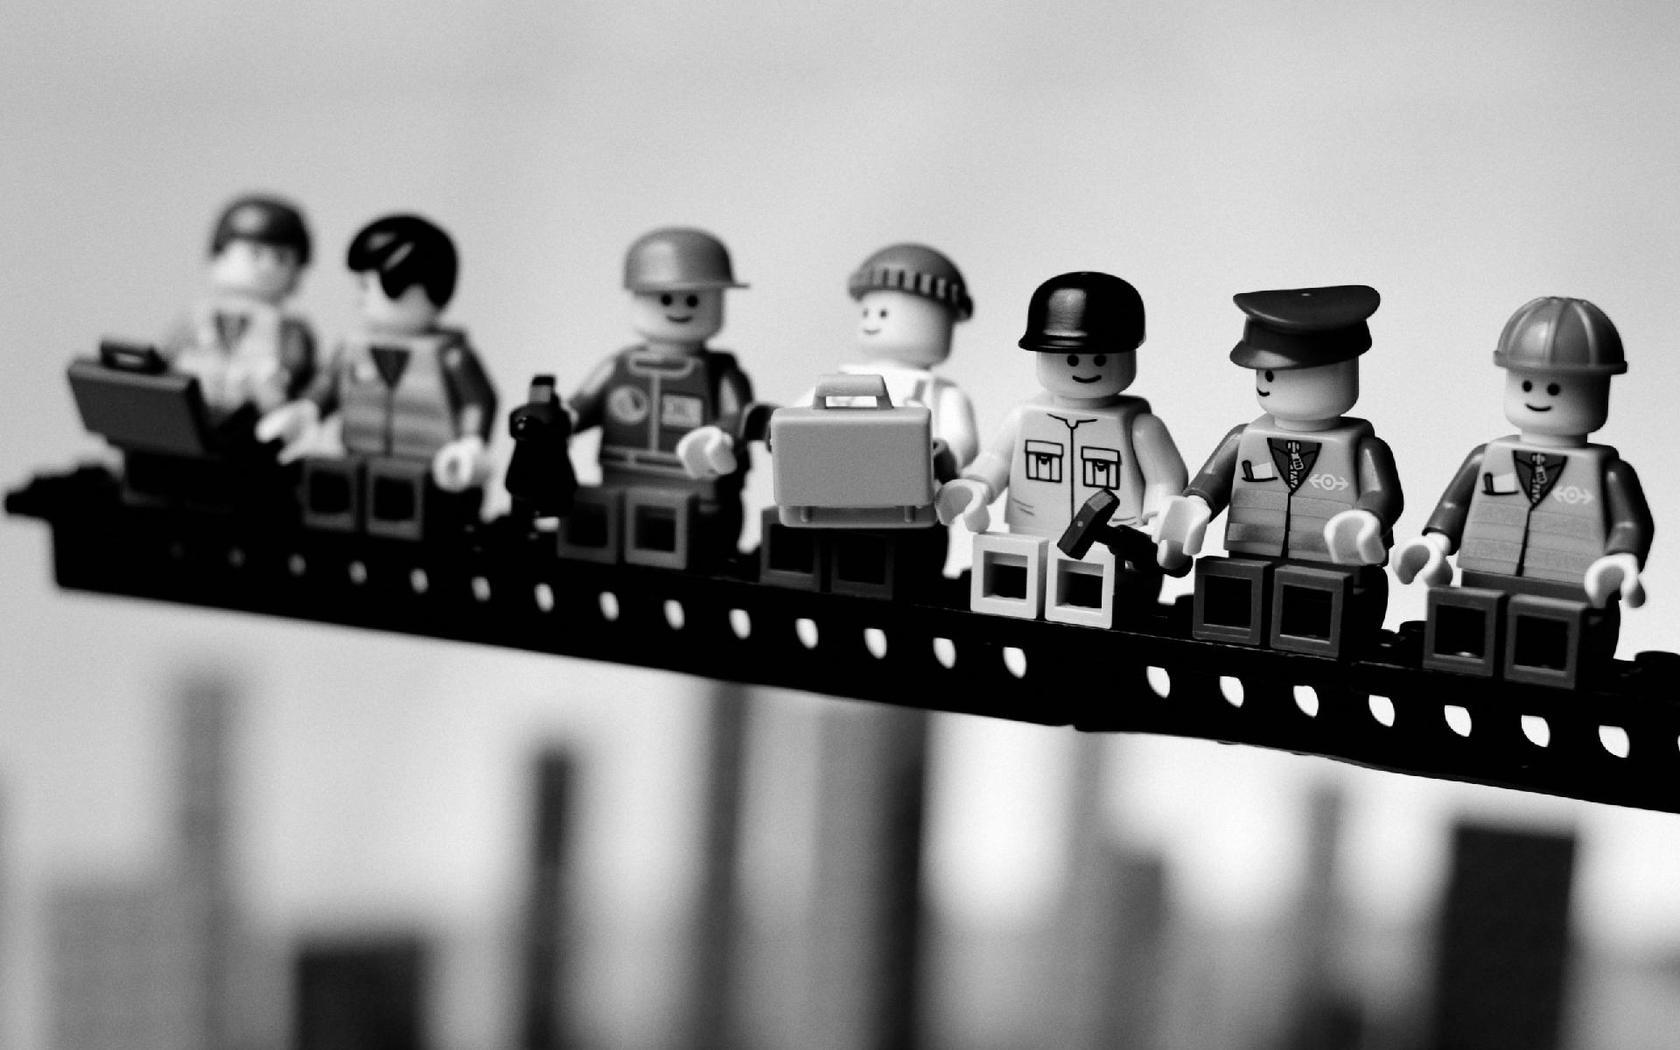 Lego Workers 1680x1050 wallpaper 1680x1050